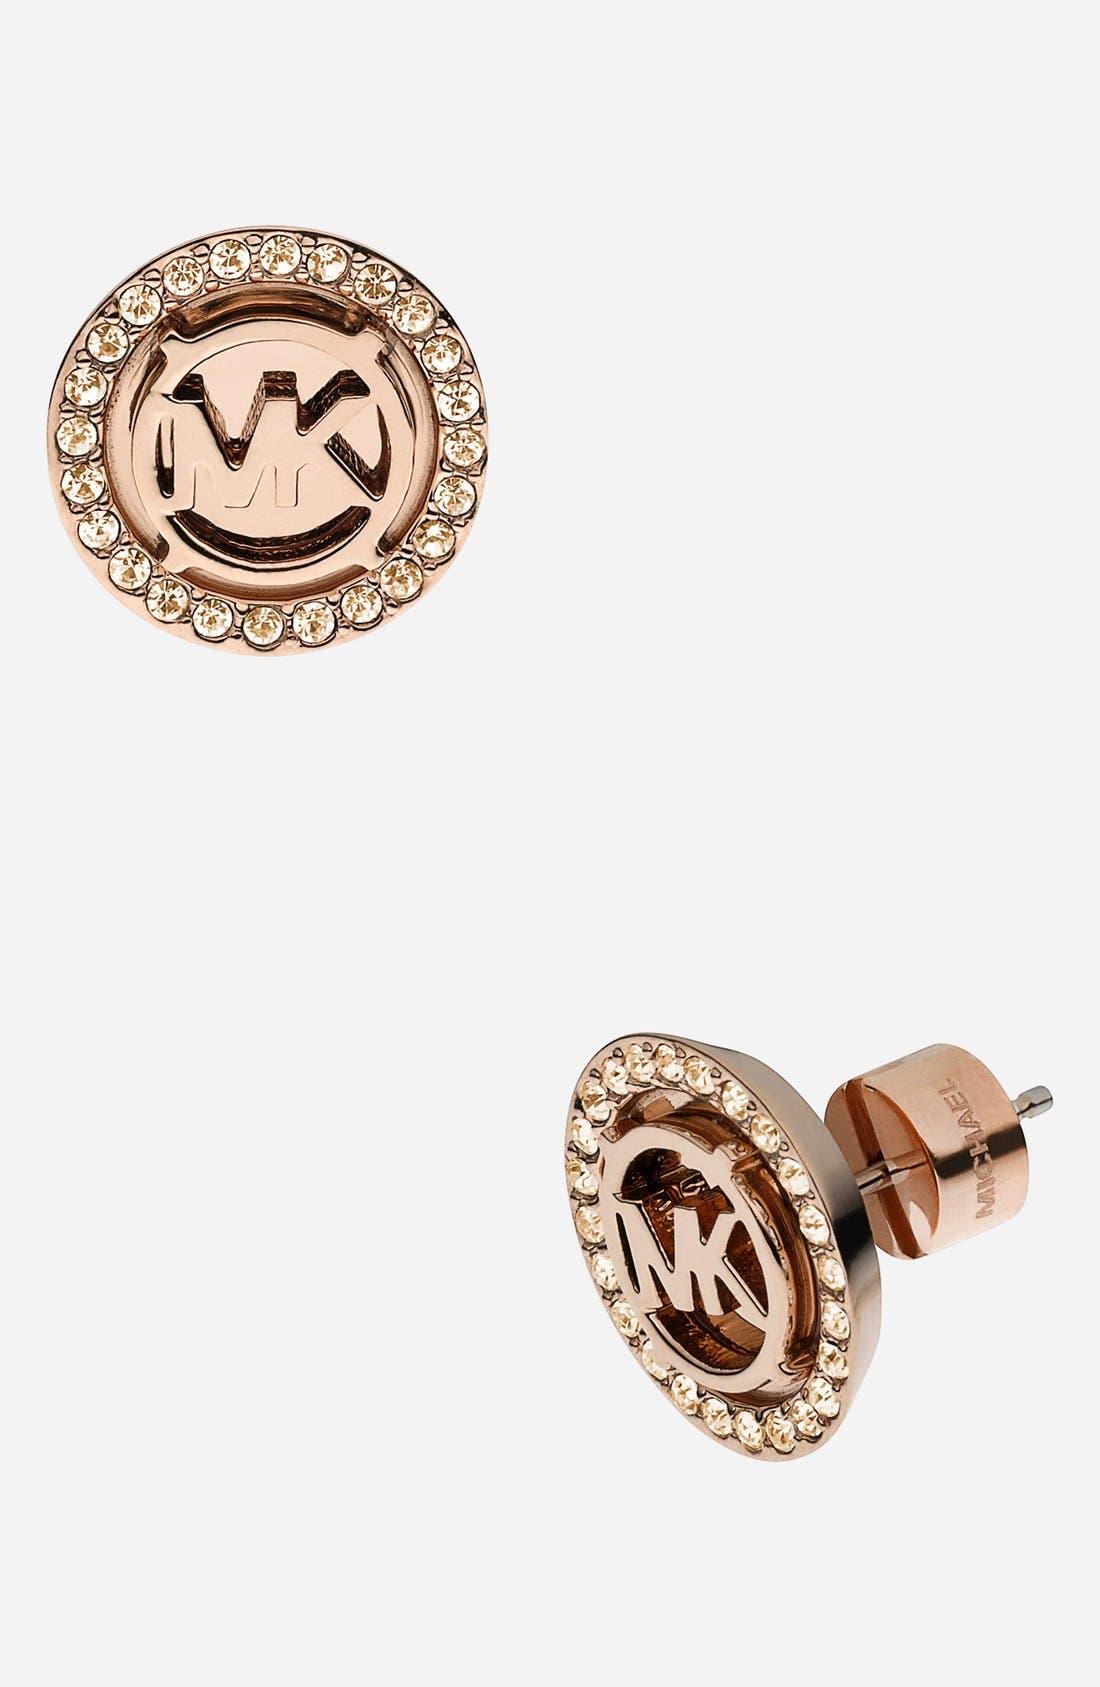 Michael Kors 'Monogram' Stud Earrings,                             Main thumbnail 1, color,                             Rose Gold/ Gold Quartz